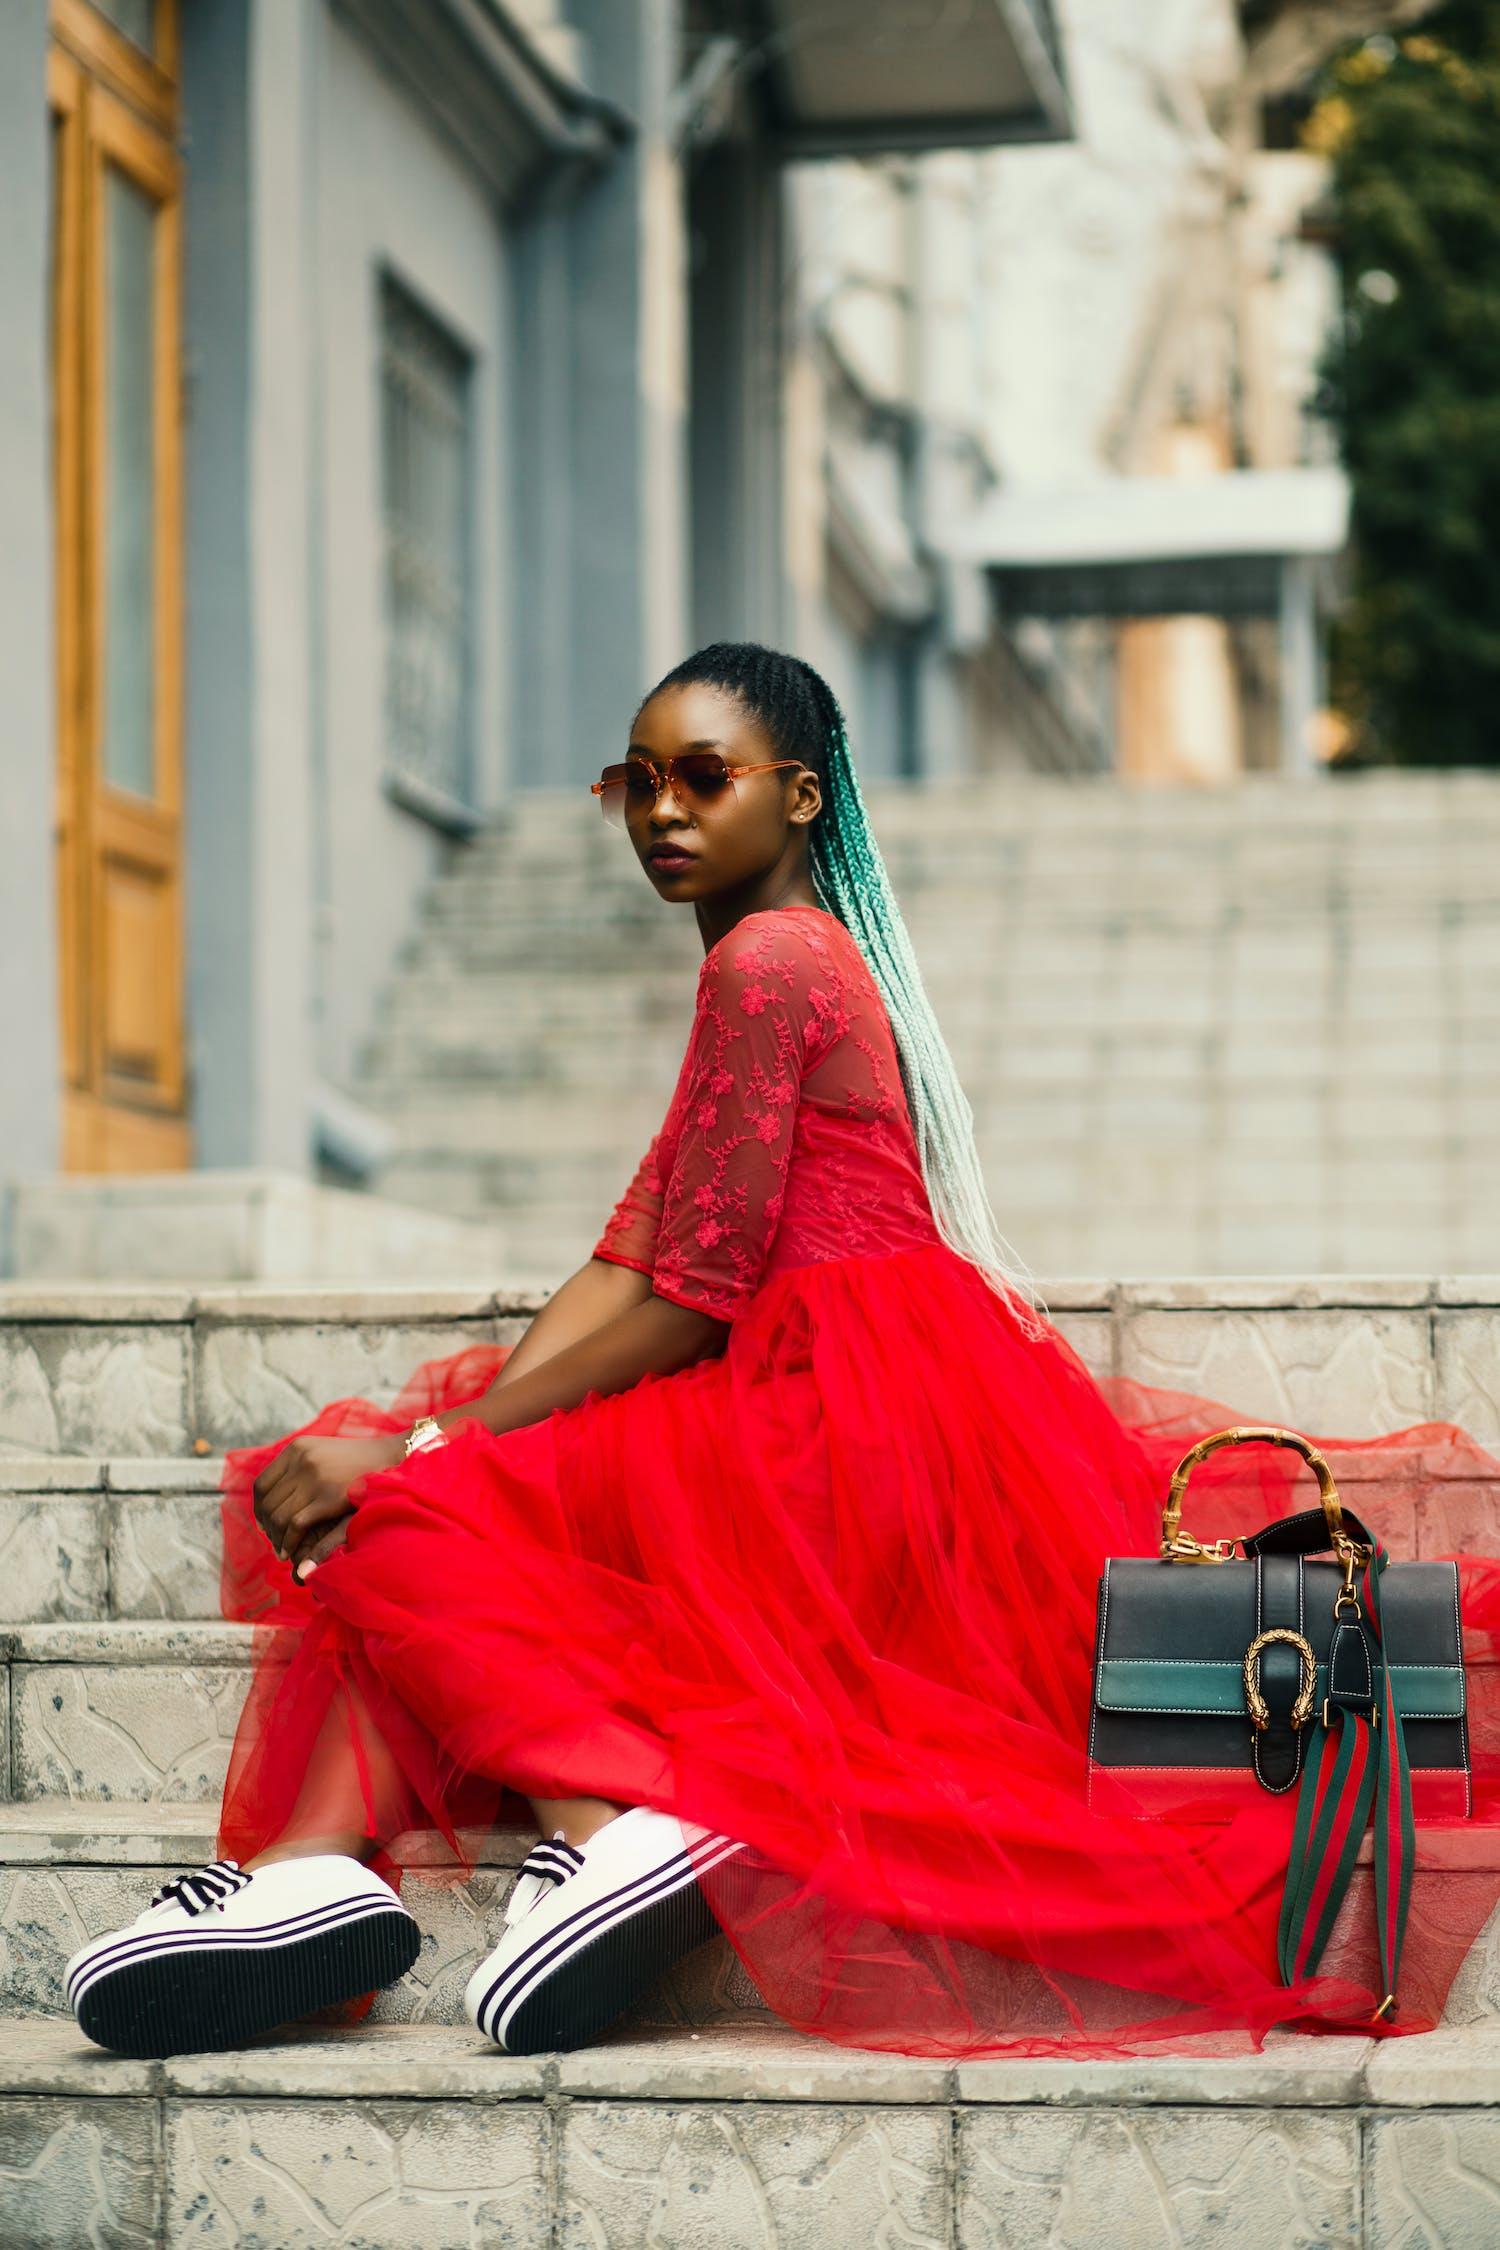 Woman Sitting on Stairway Wearing Sunglasses